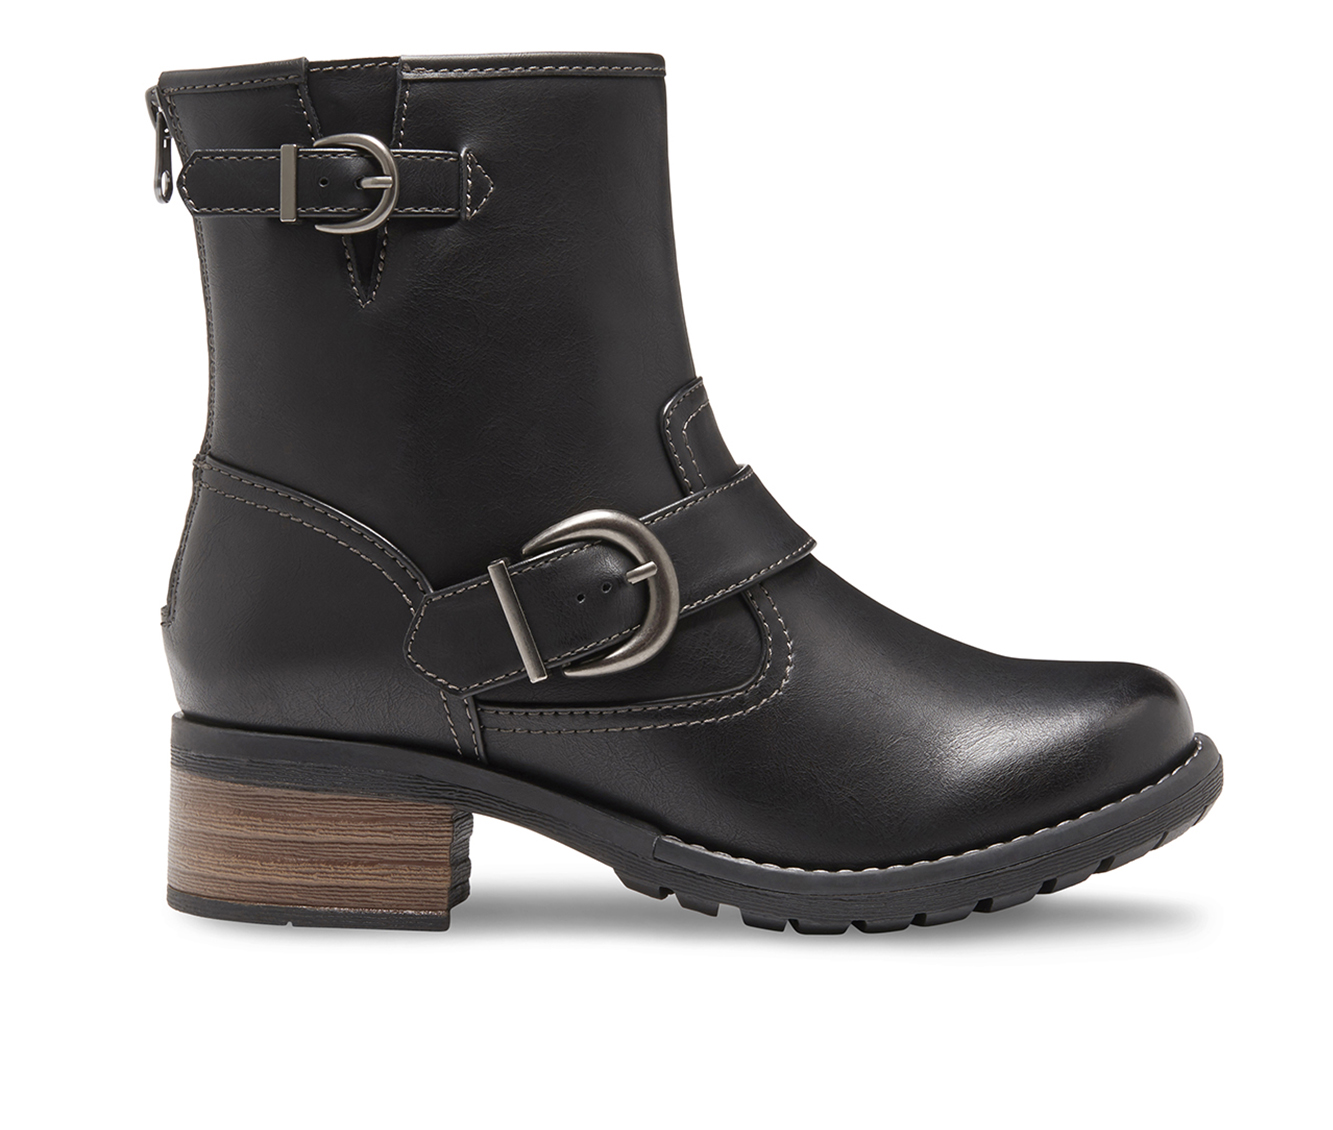 Eastland Ada Women's Boots (Black - Leather)